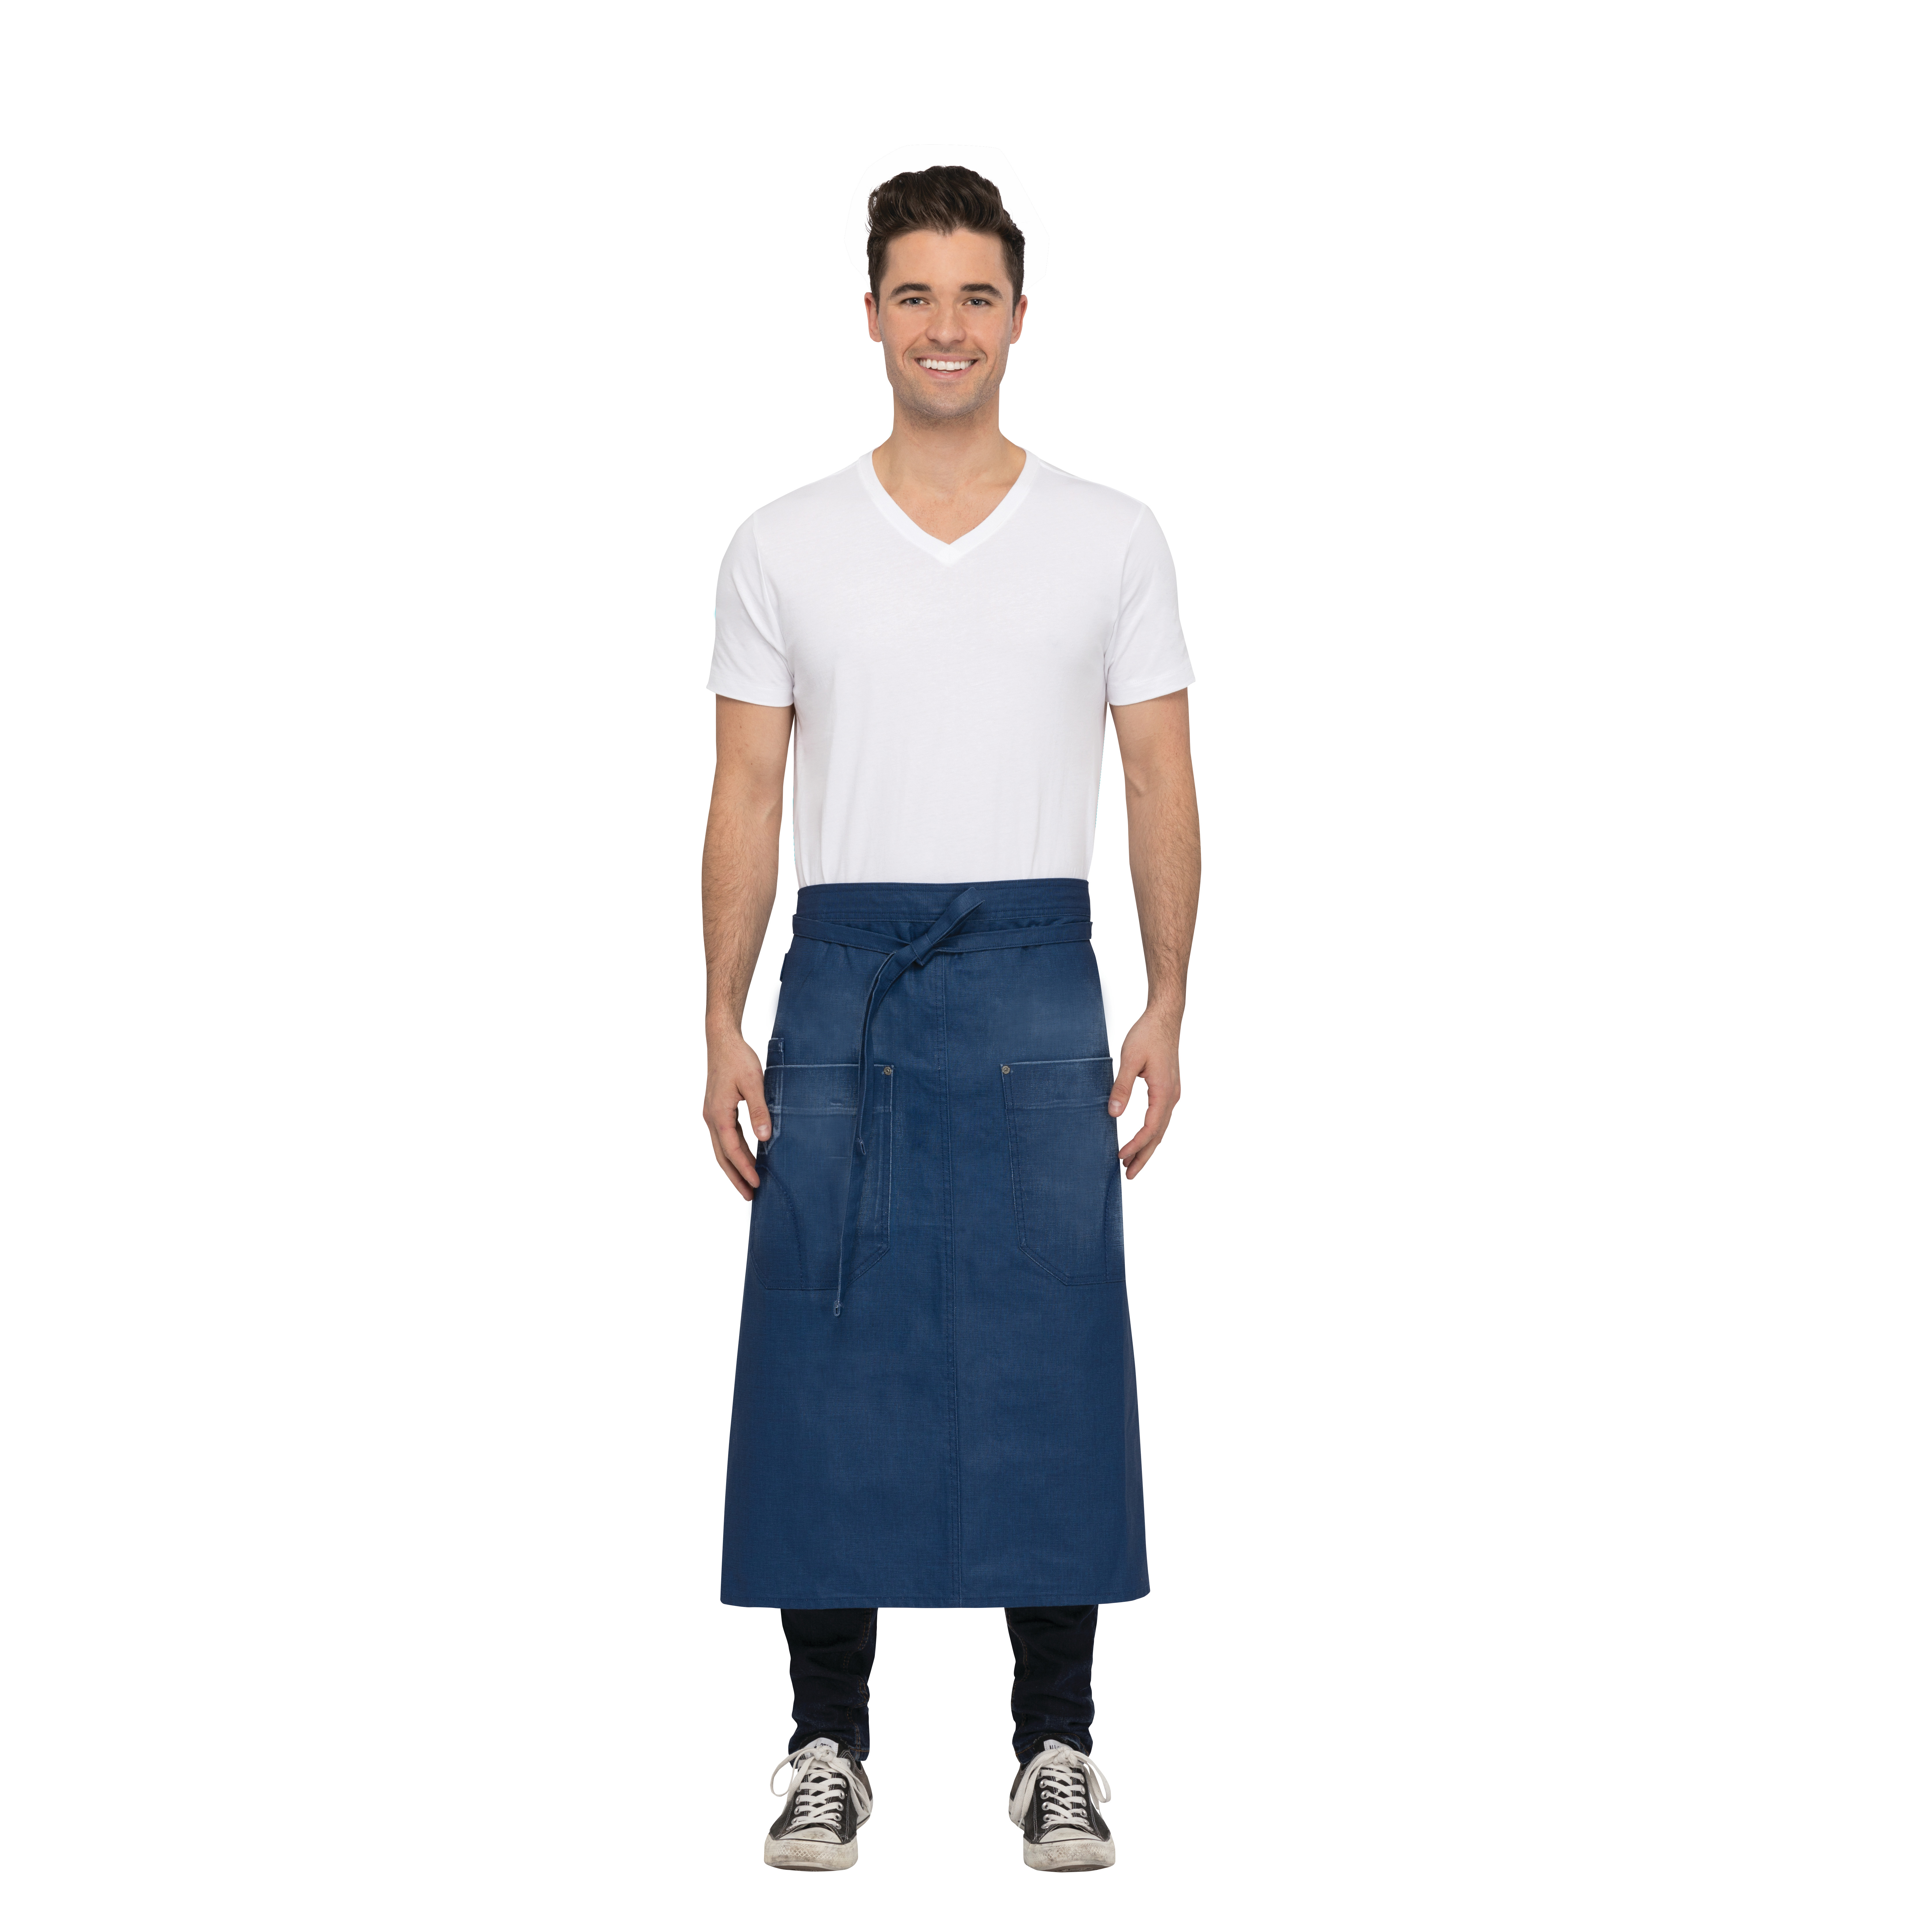 Chef Works AIN01ROY0 waist apron